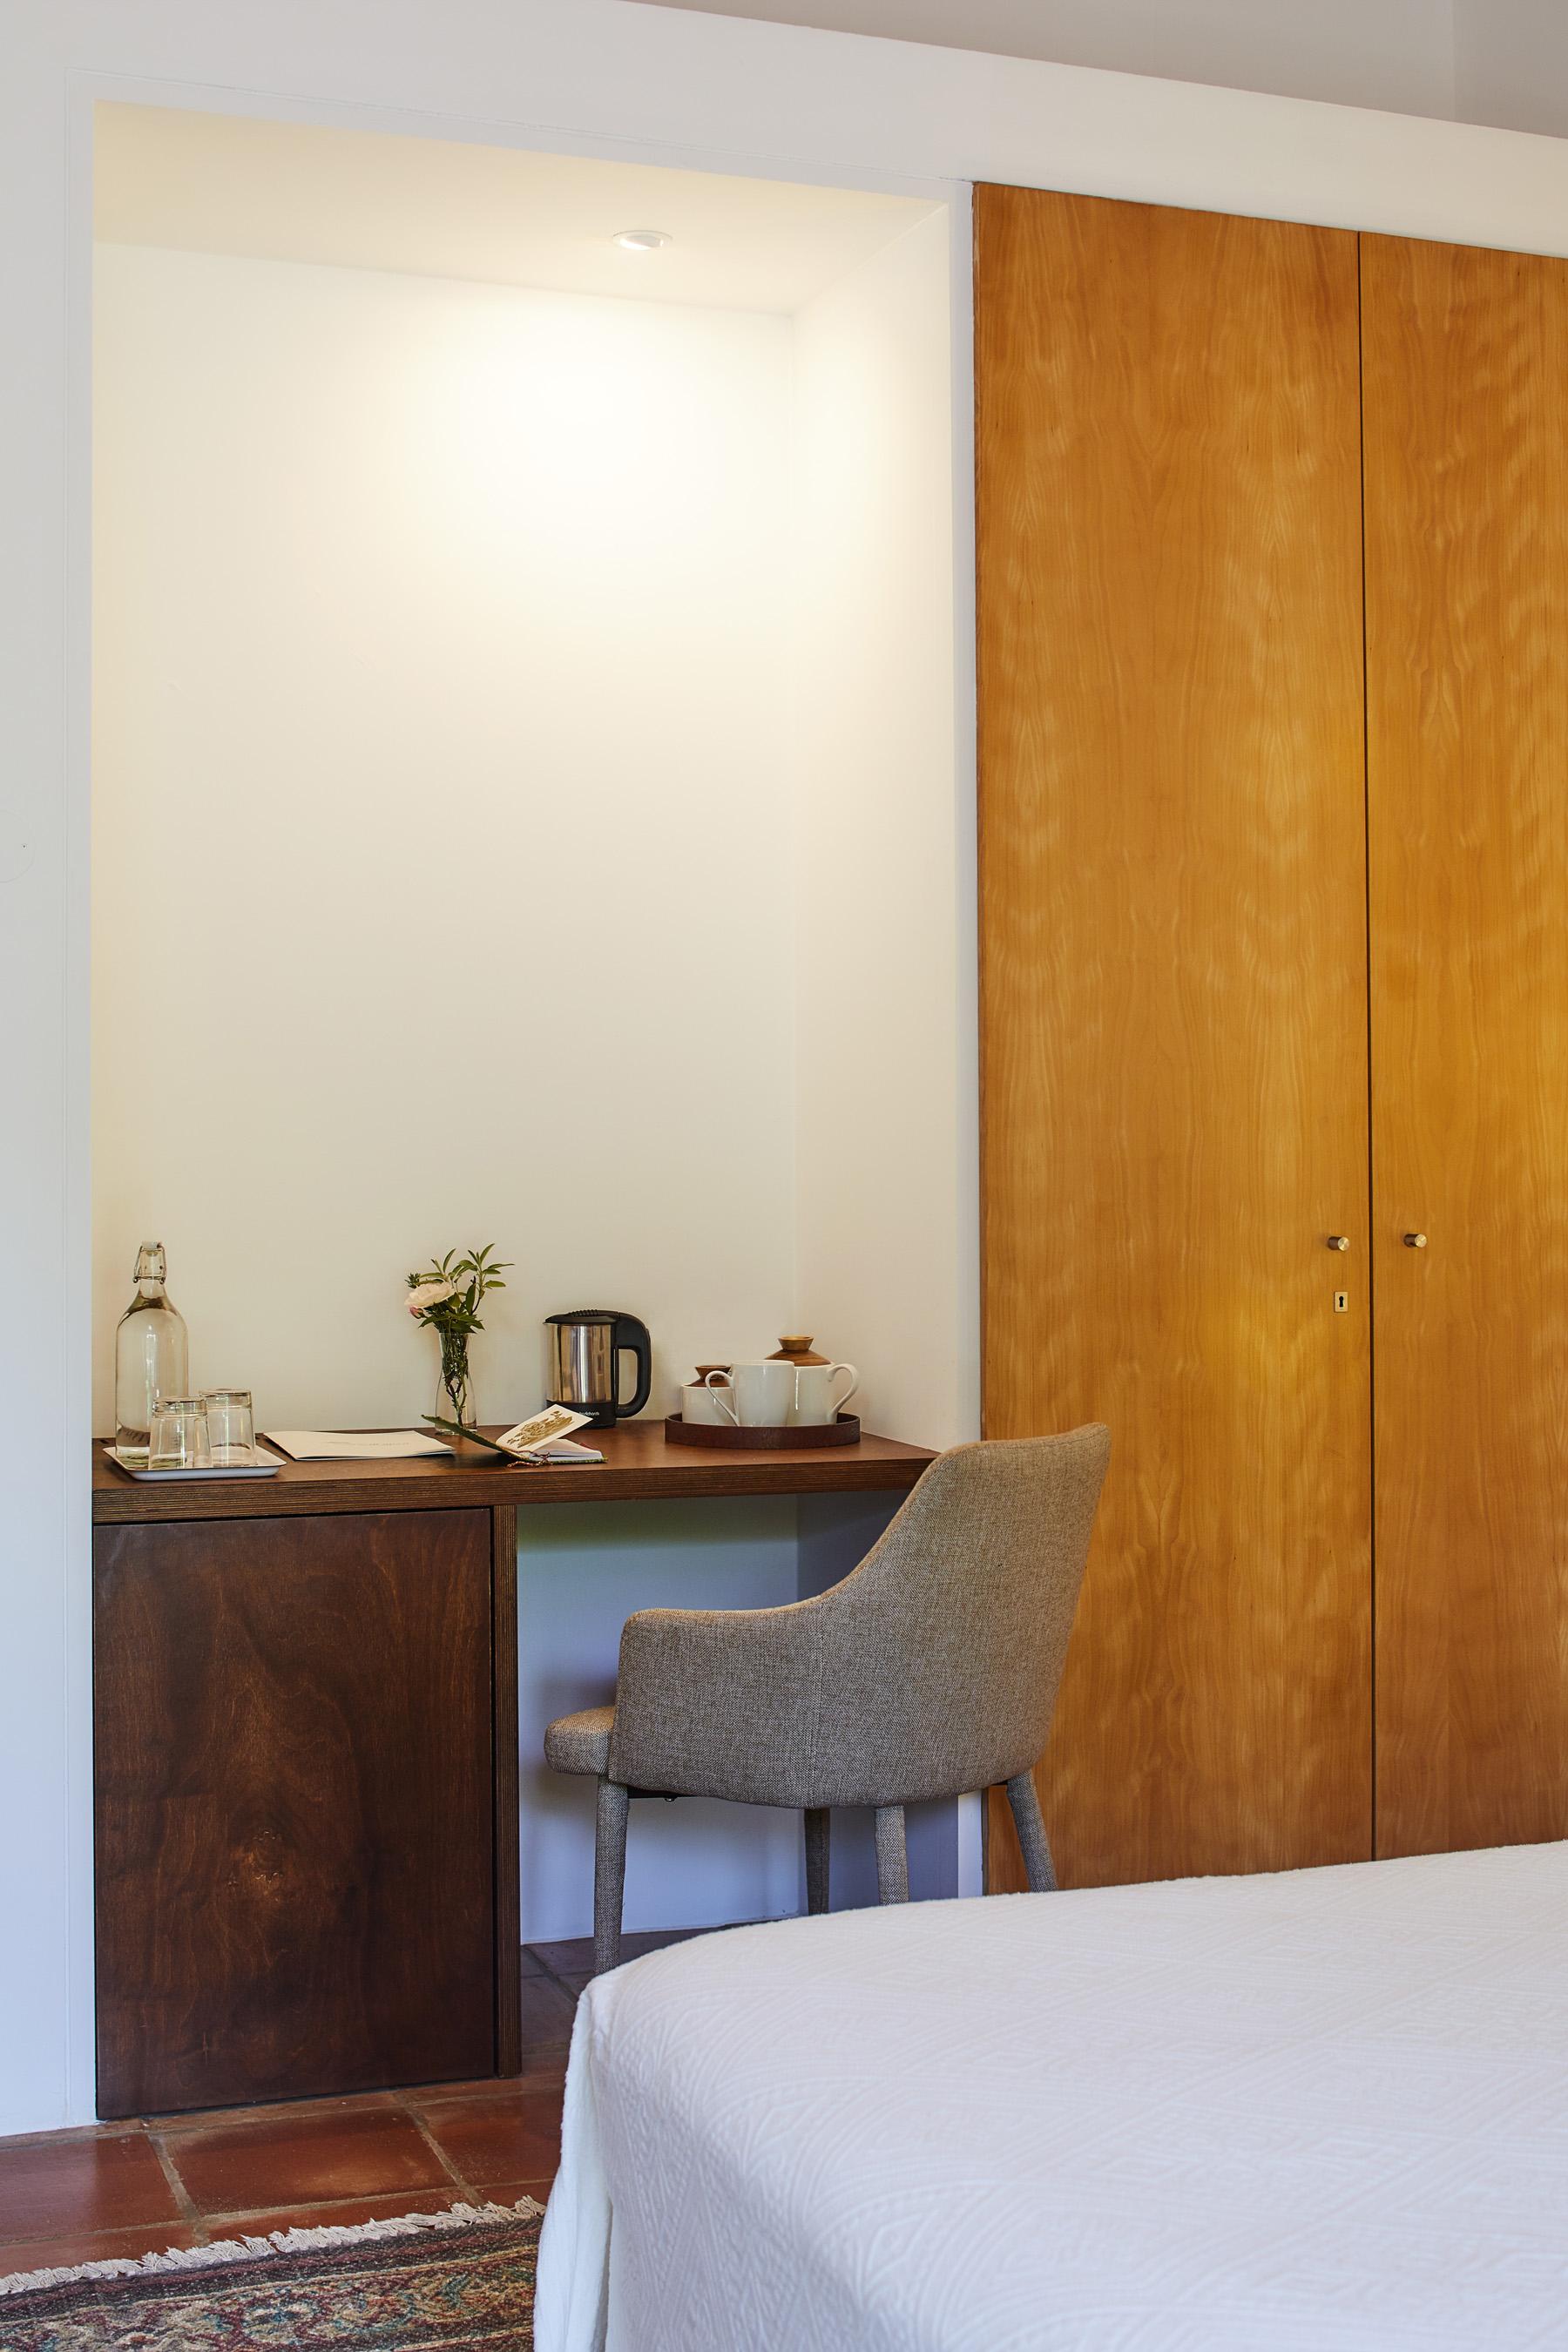 Habitación 2 - detalle decoración